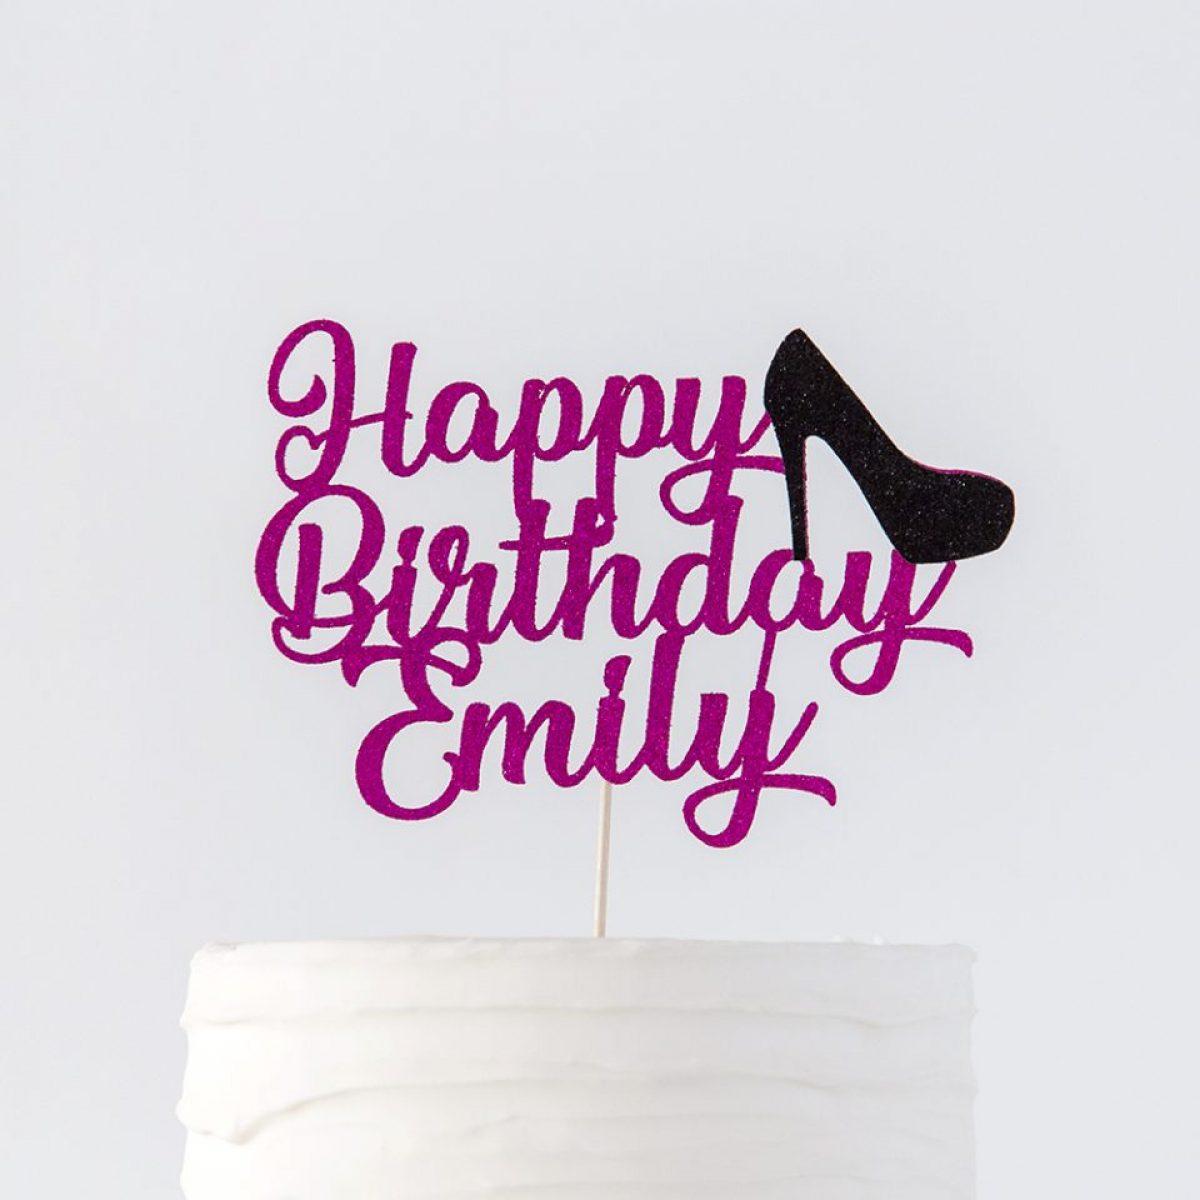 Pleasing Personalised Birthday Cake Topper With Decoration To Match Any Personalised Birthday Cards Petedlily Jamesorg